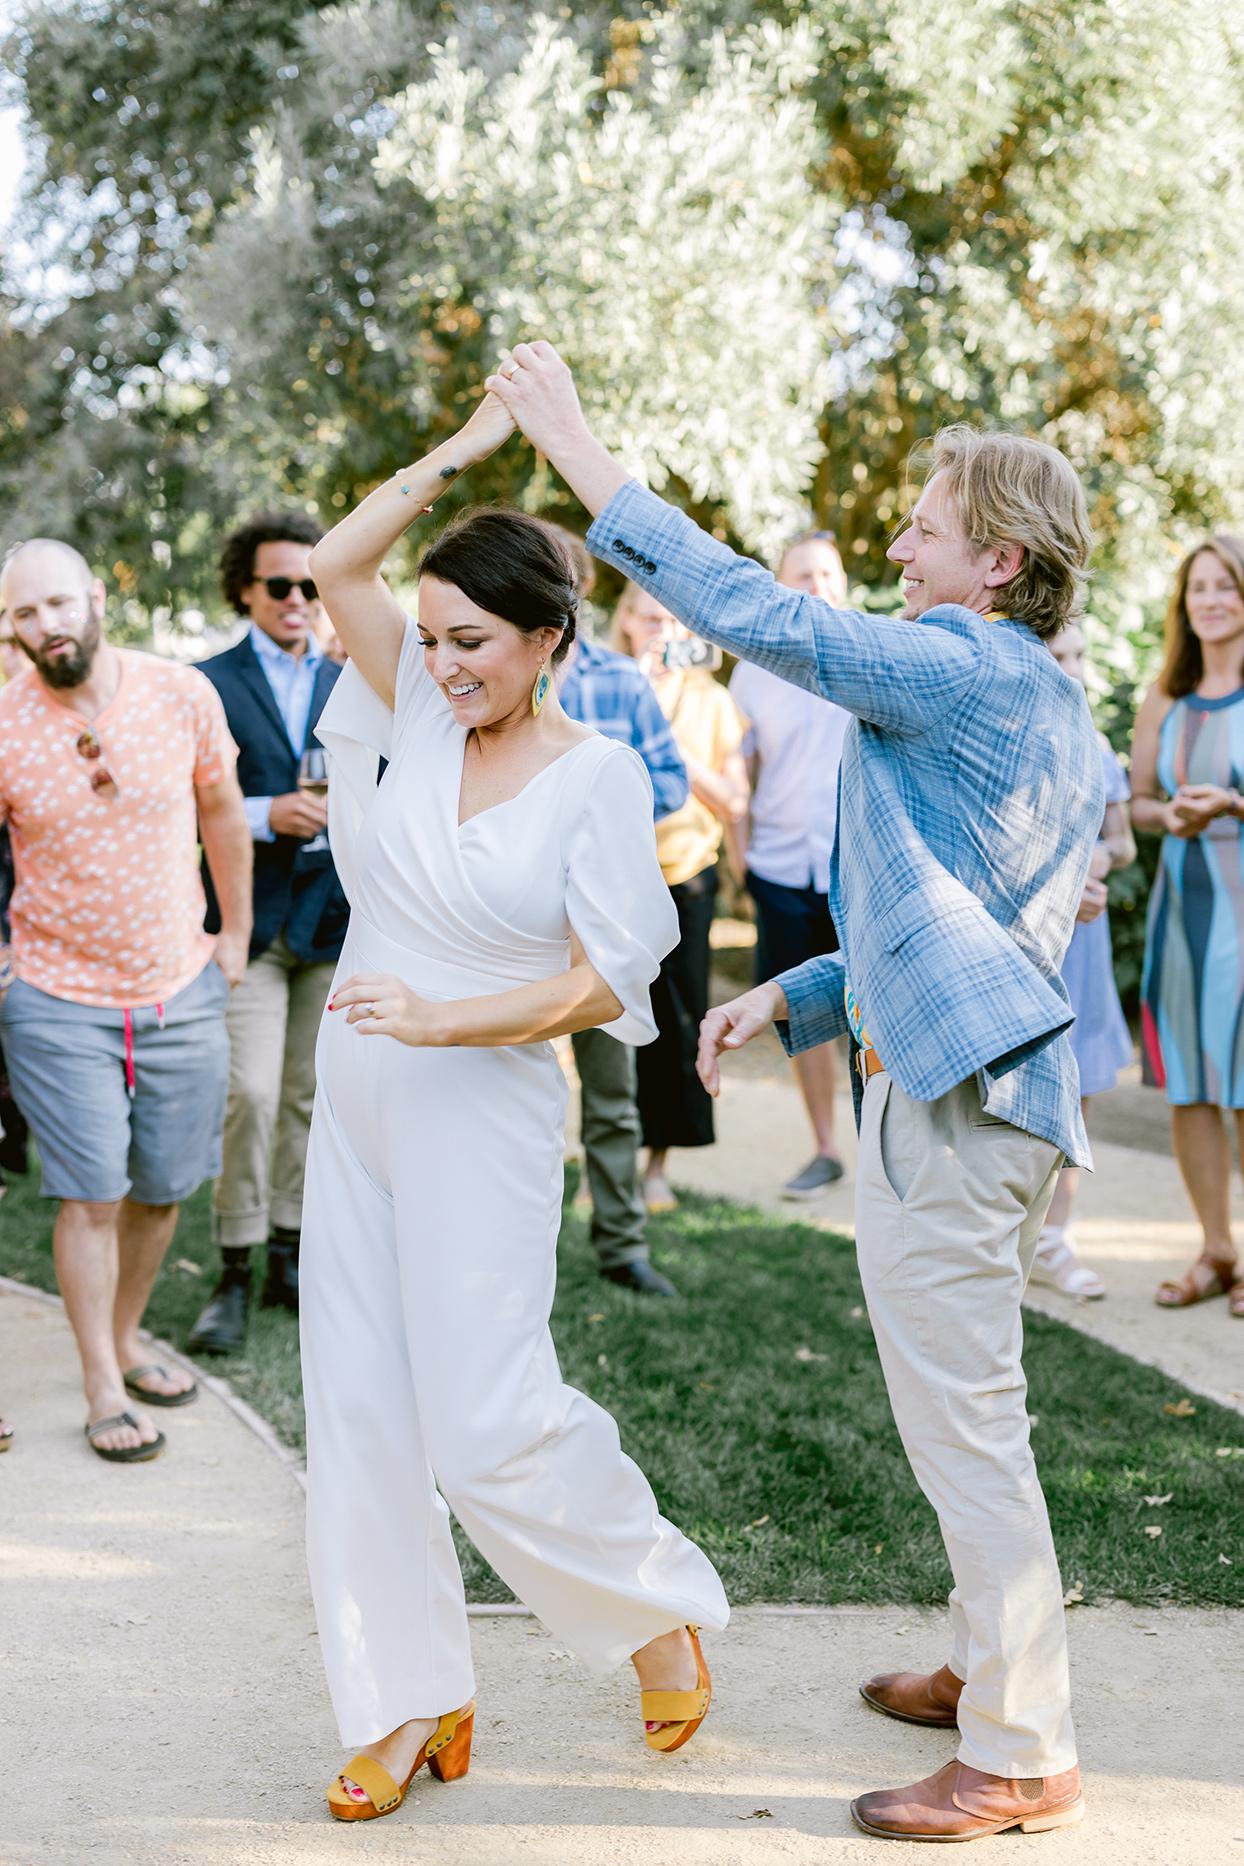 wedding couple dancing at reception in casual attire